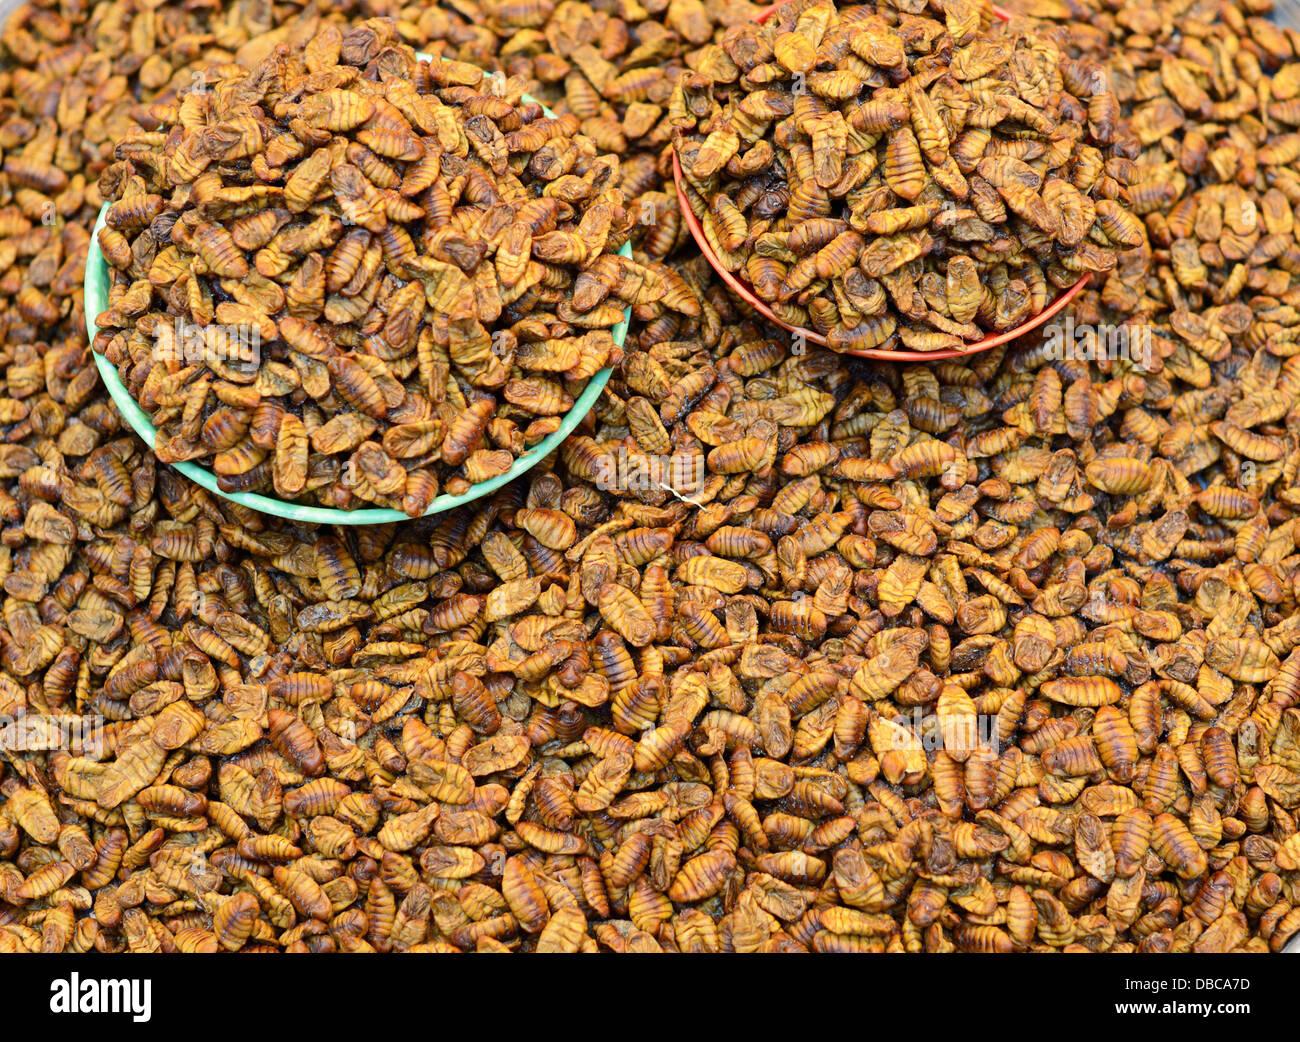 Beoundegi silkworm pupa for sale as a snack in Seoul, South Korea. - Stock Image